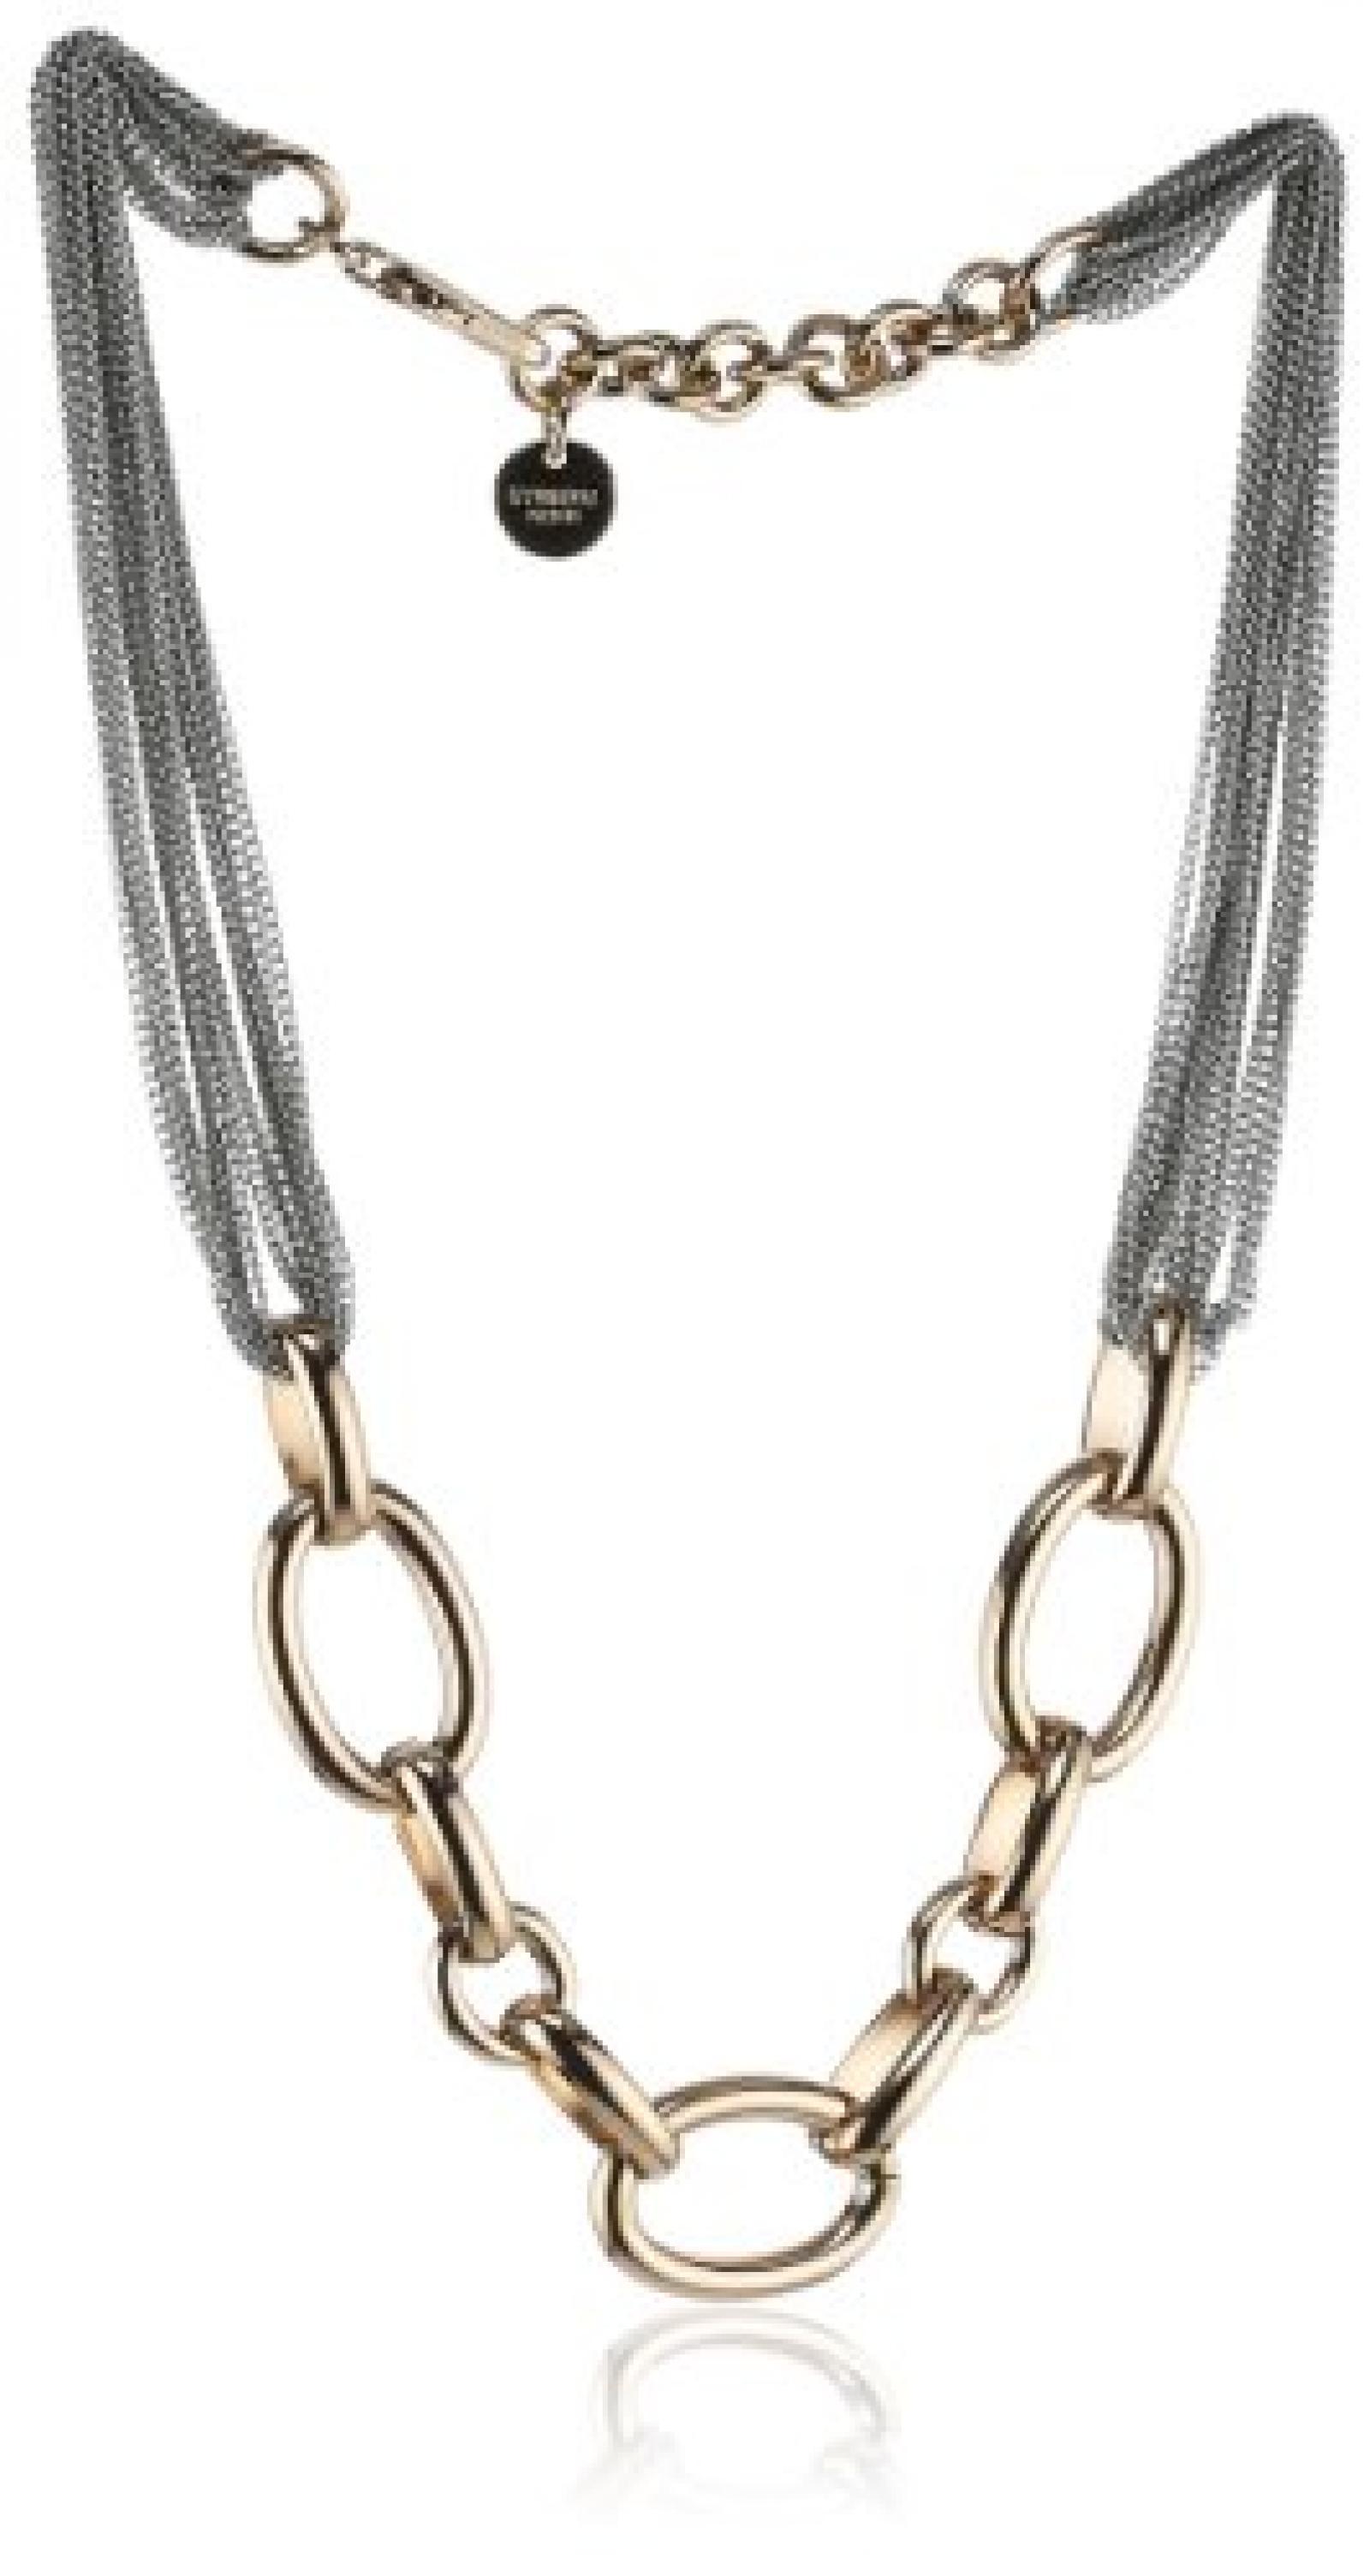 Dyrberg/Kern Damen-Halsband Vergoldetes Metall 335149